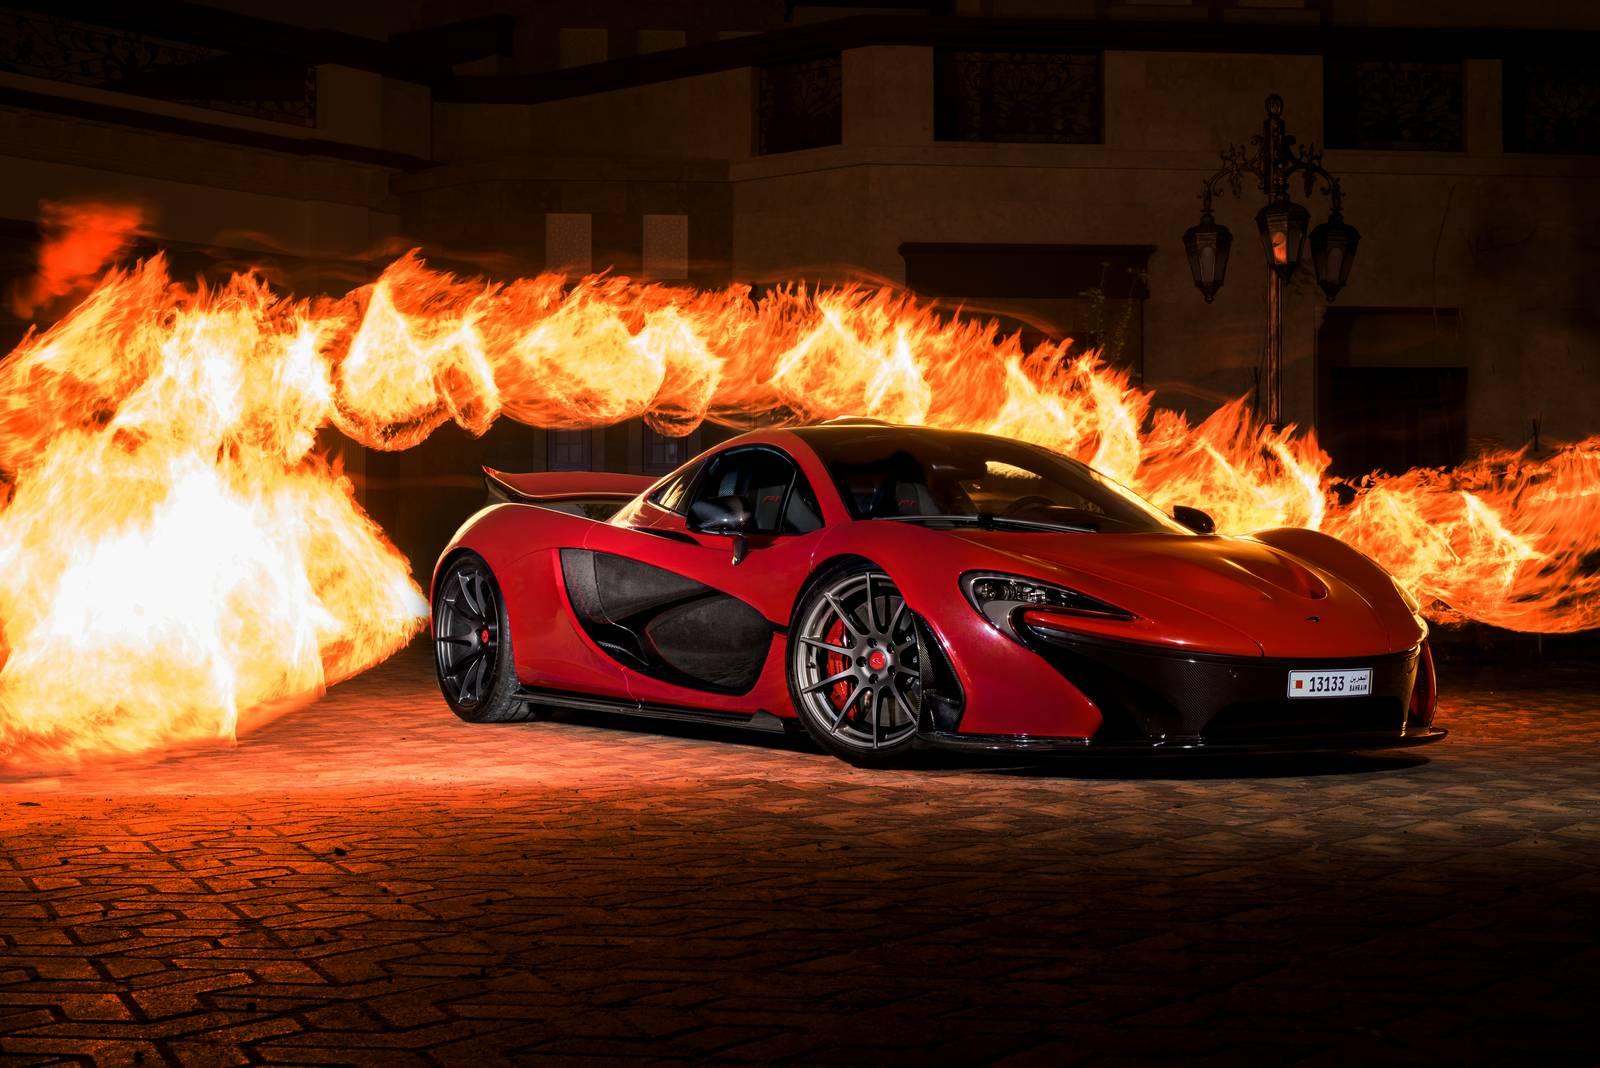 Valentines Special 1 Of 1 Junaid Flame MSO McLaren P1 In